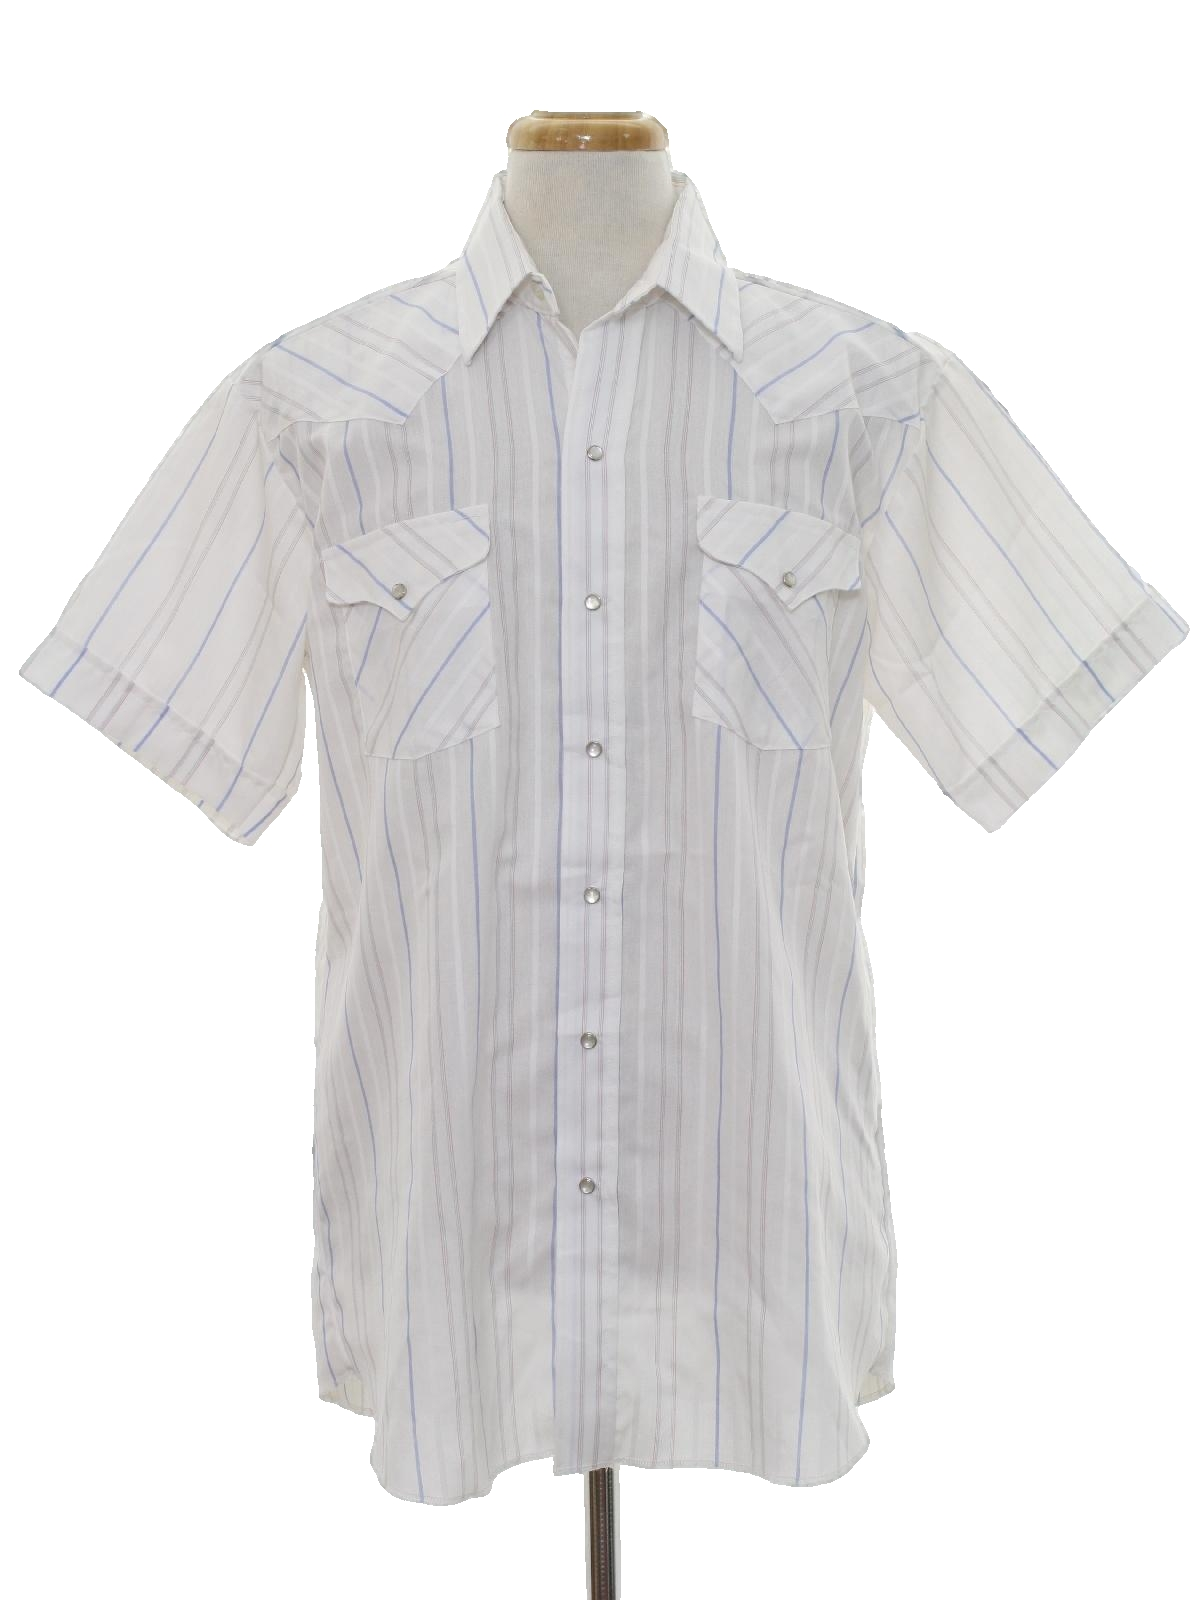 Dress Shirts Made In Usa